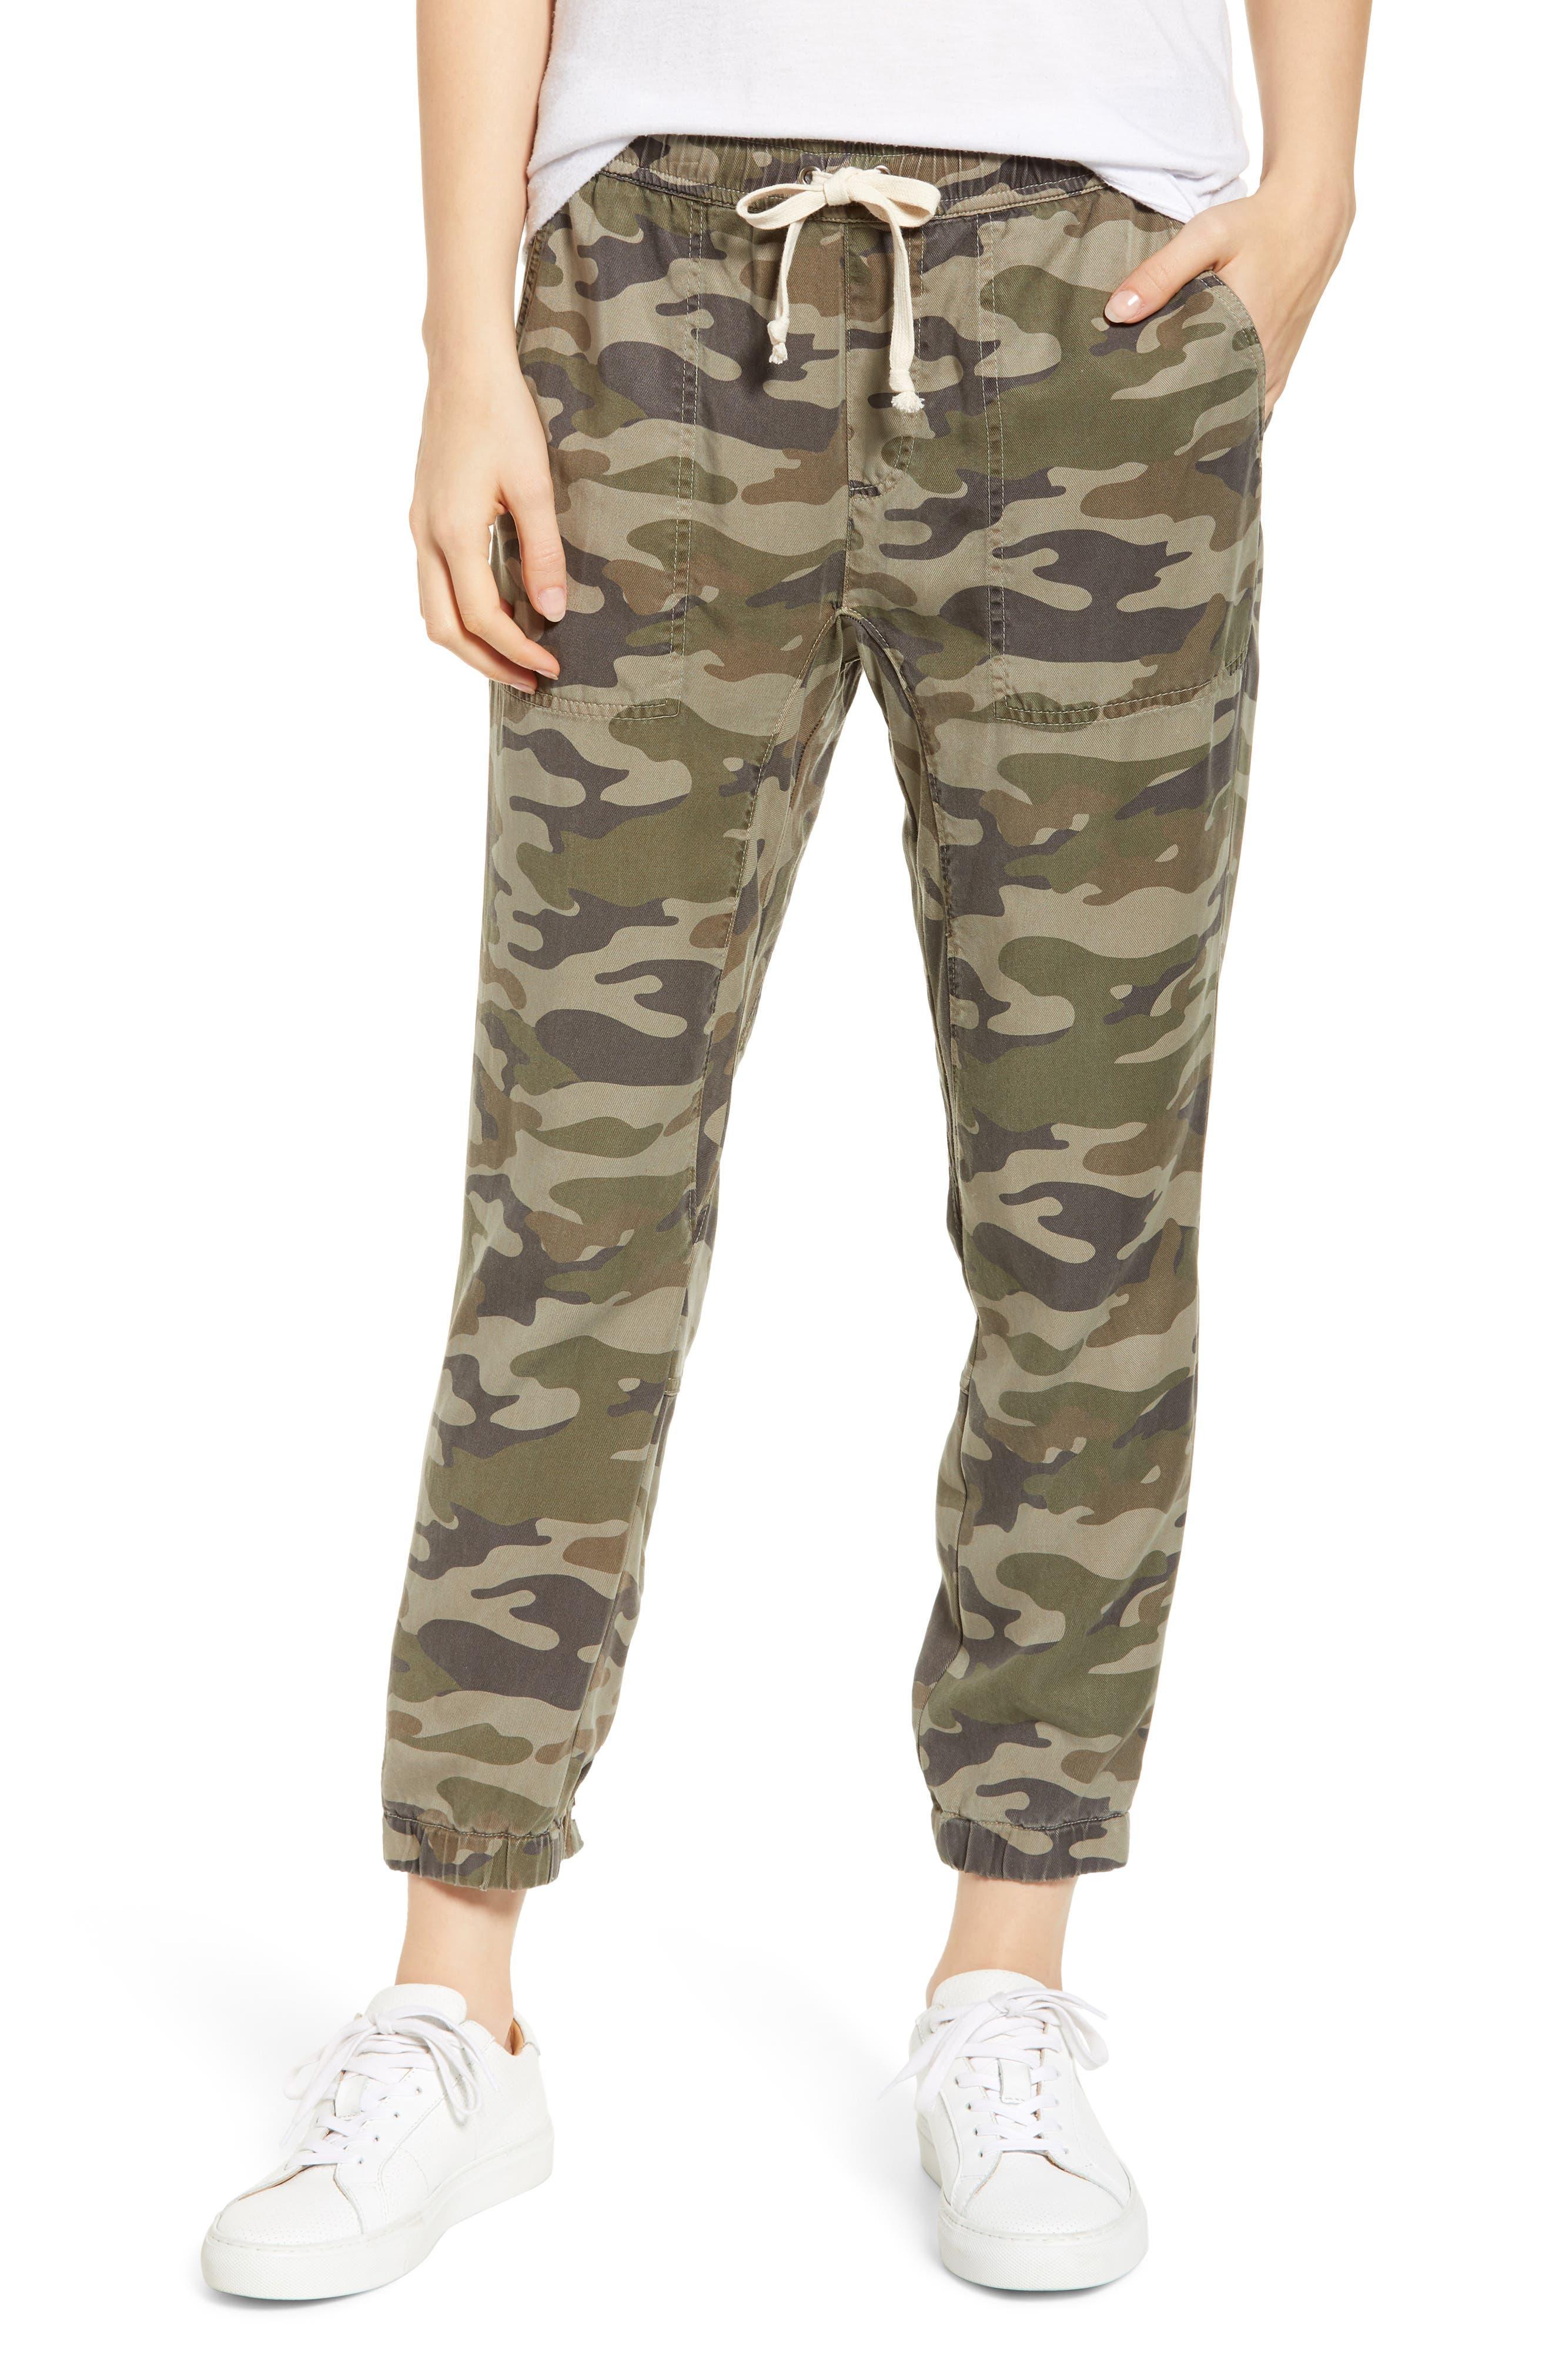 Clay Camo Lace-Up Pants, Main, color, CLAY CAMO